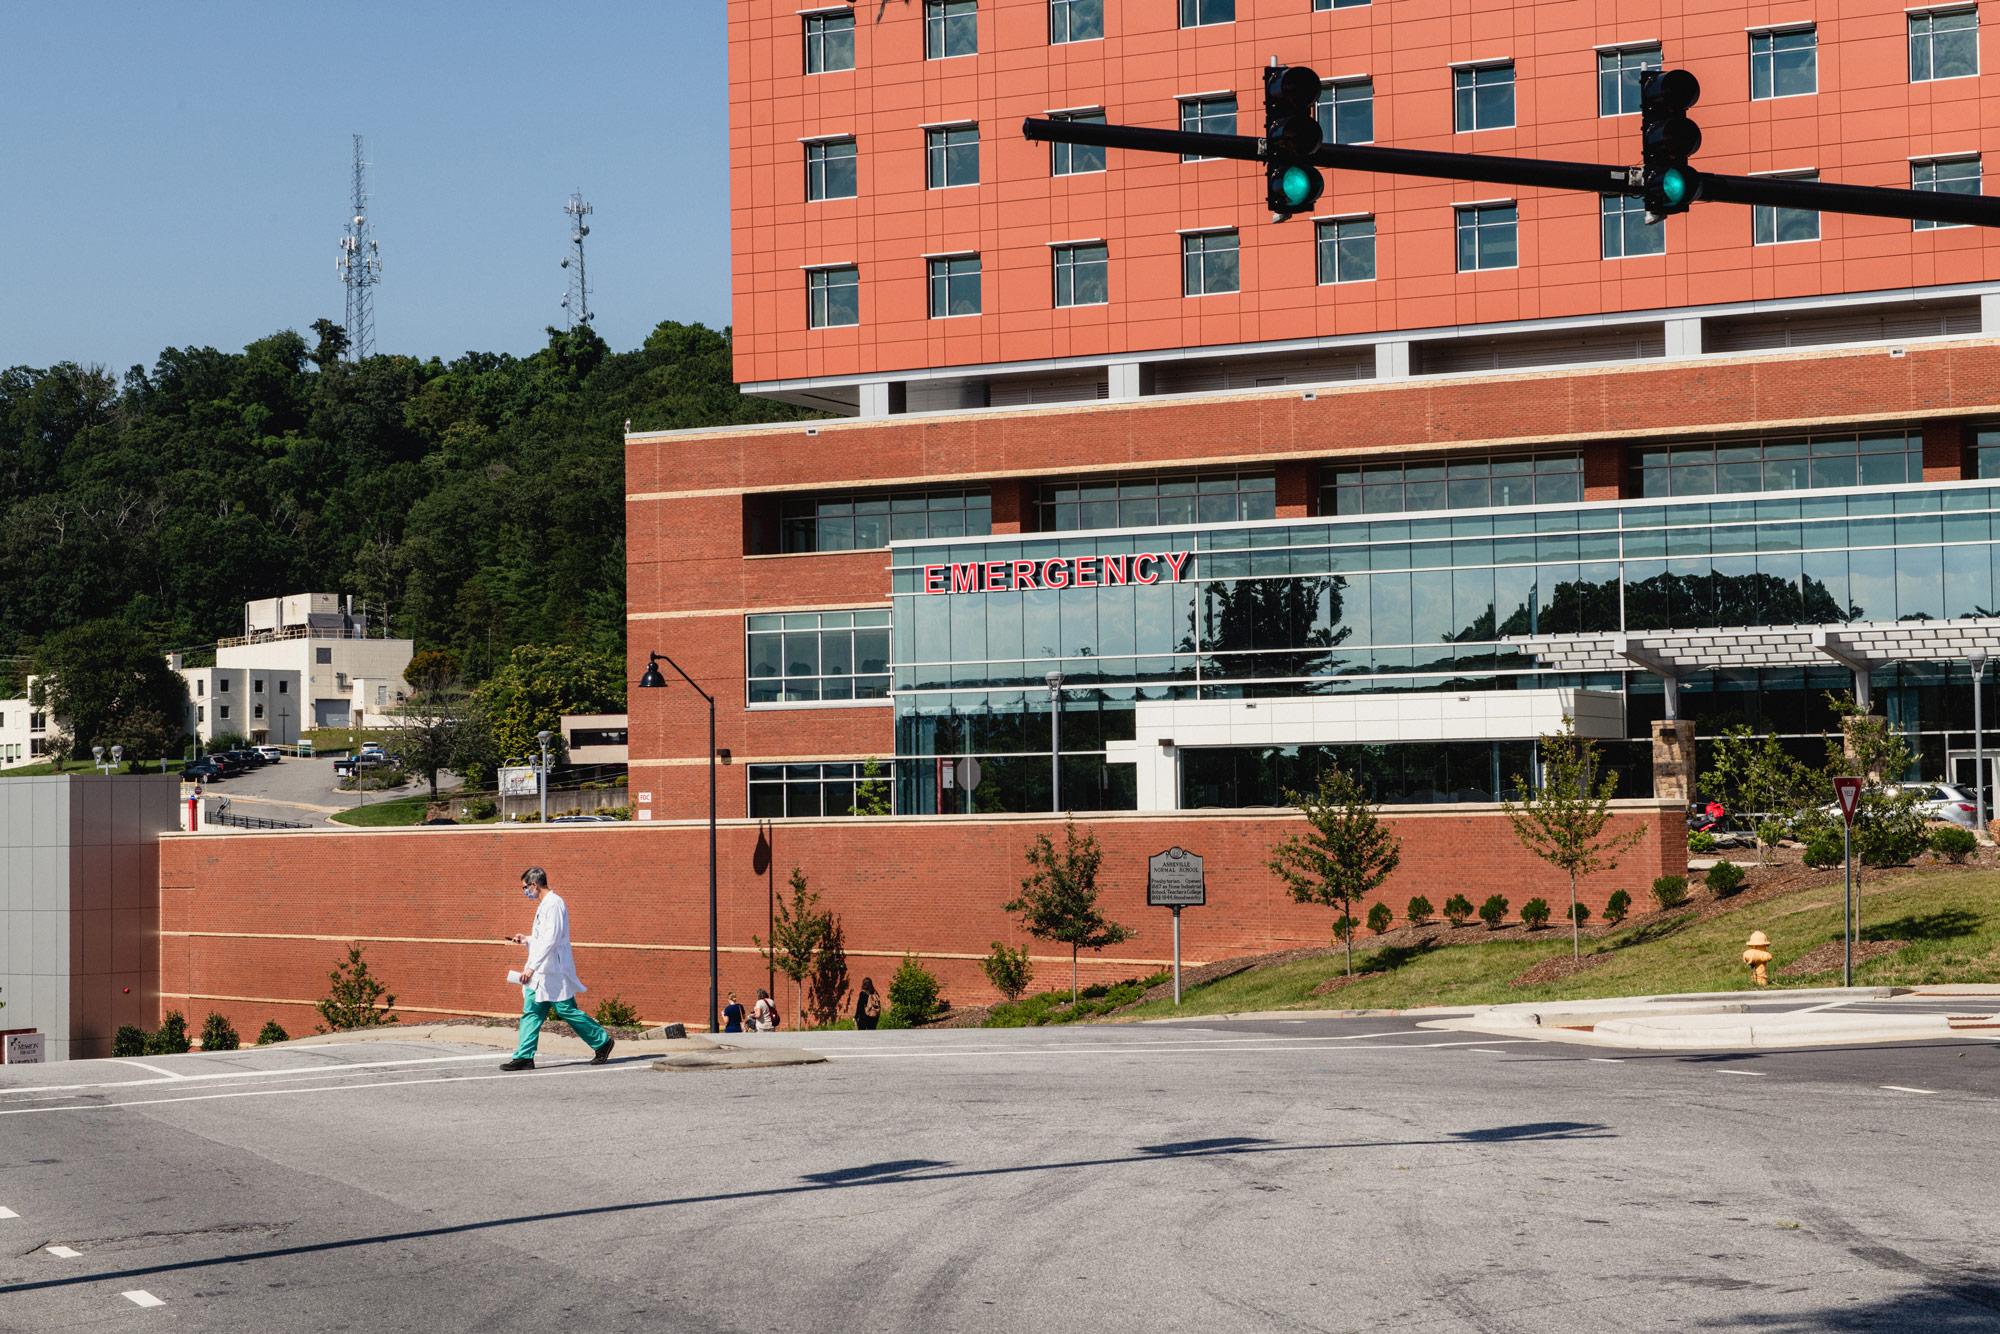 North Carolina sets new record for Covid-19 hospitalizations 1